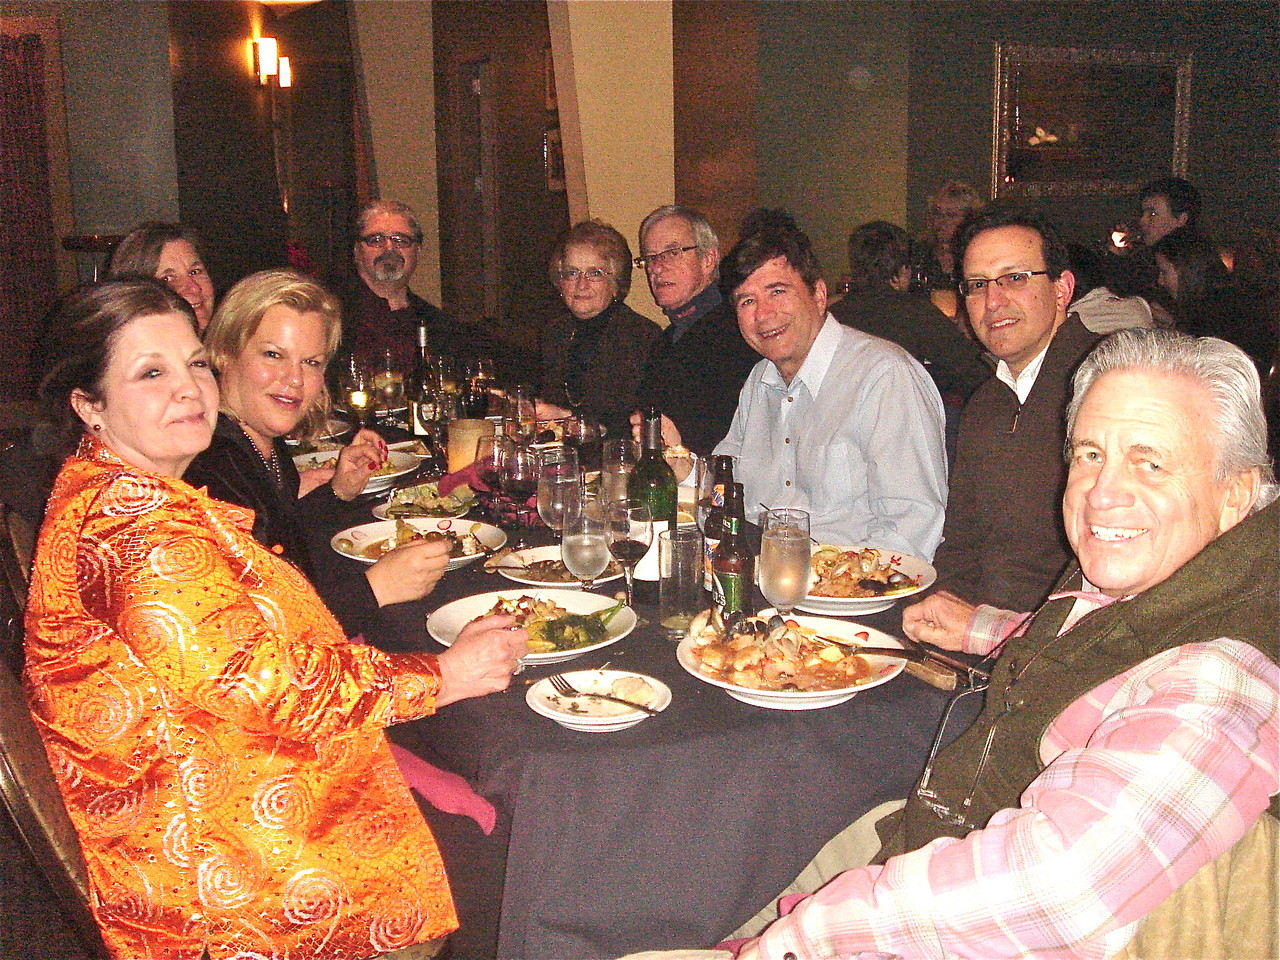 Jean Tringle, Celeste, Cyndi Signorelli, Robert Tringle, Jeanne & John Sheridan, John Wagner, & Stuart Kagel